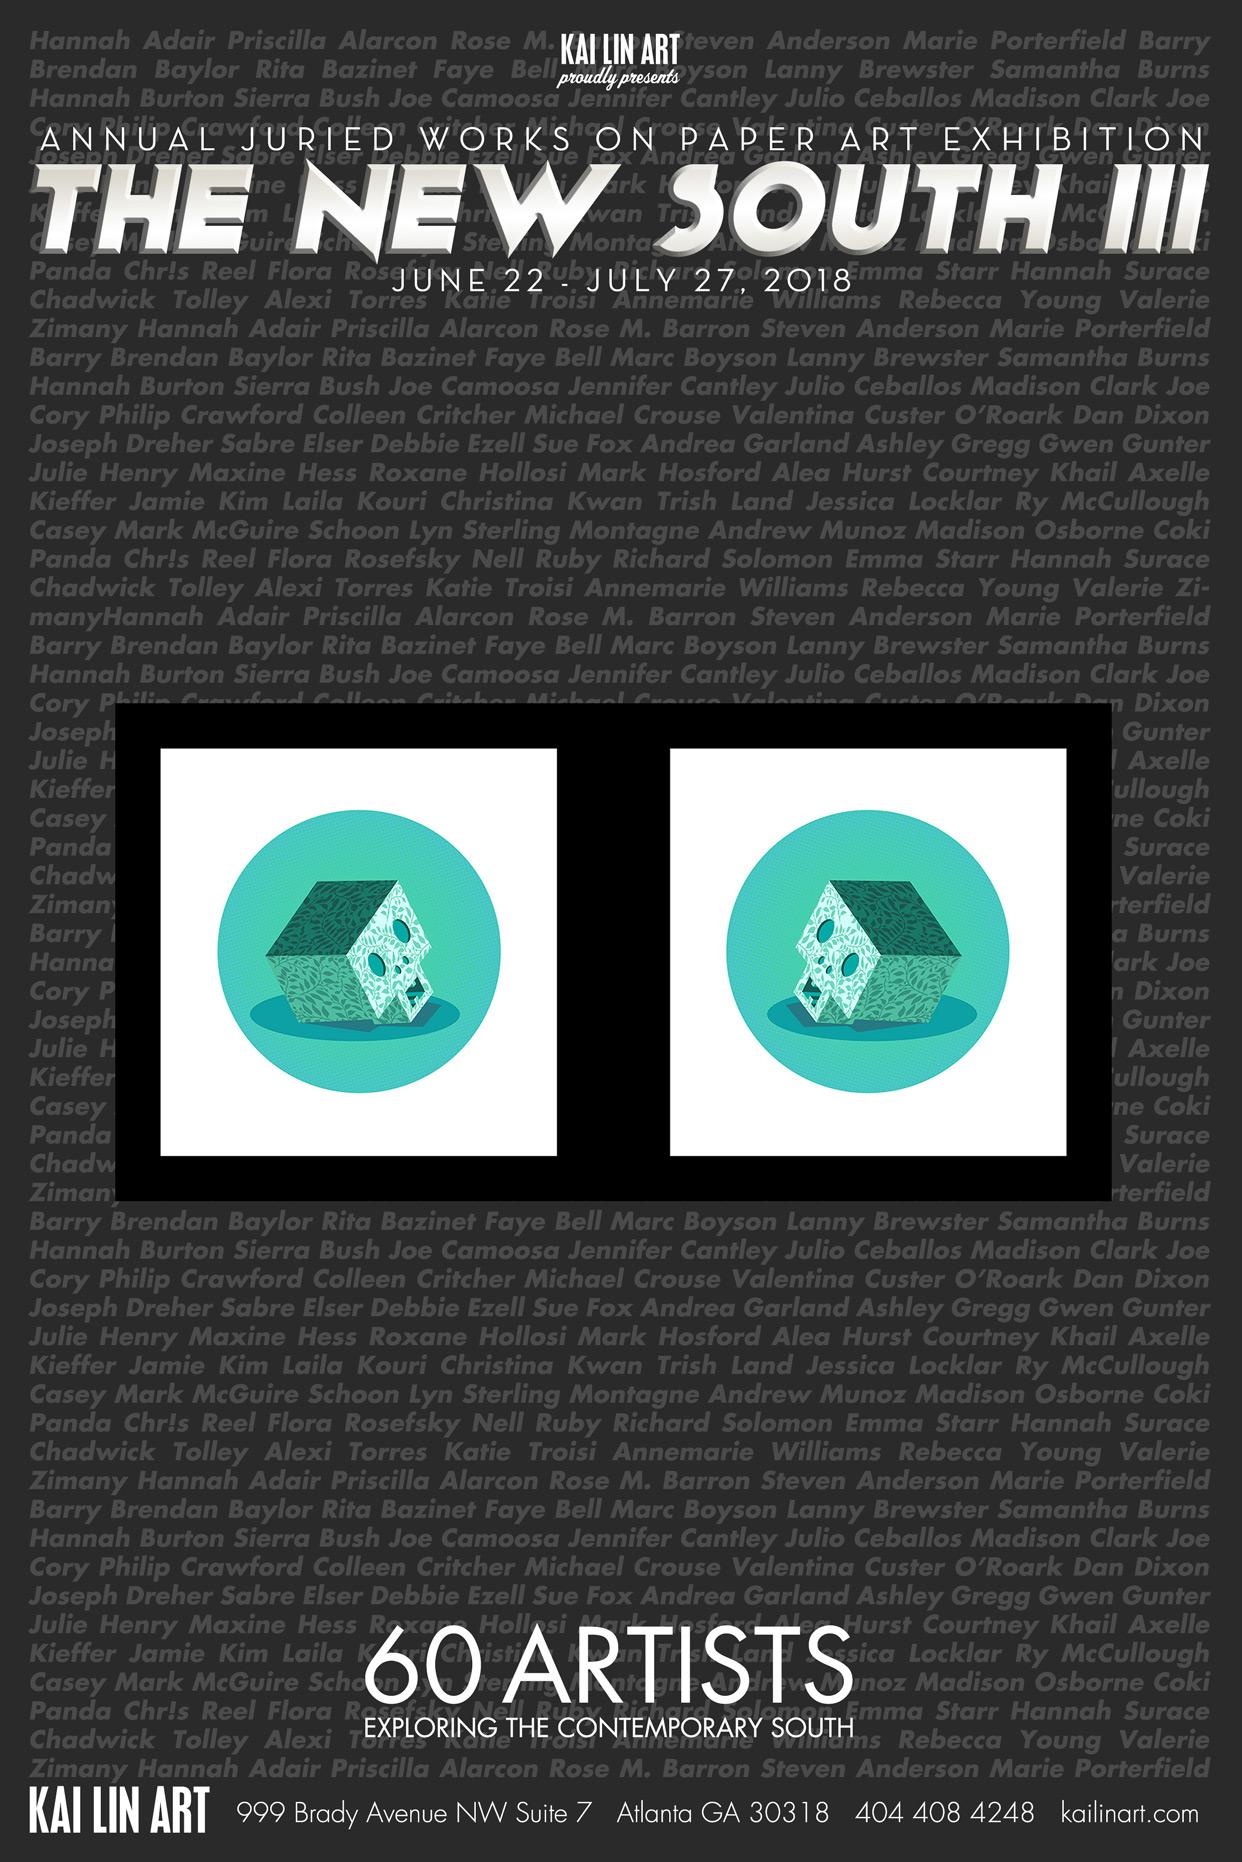 Hosford_Mark_Blue-Momento-Mori-1_2_Screenprint_25x12.5.jpg